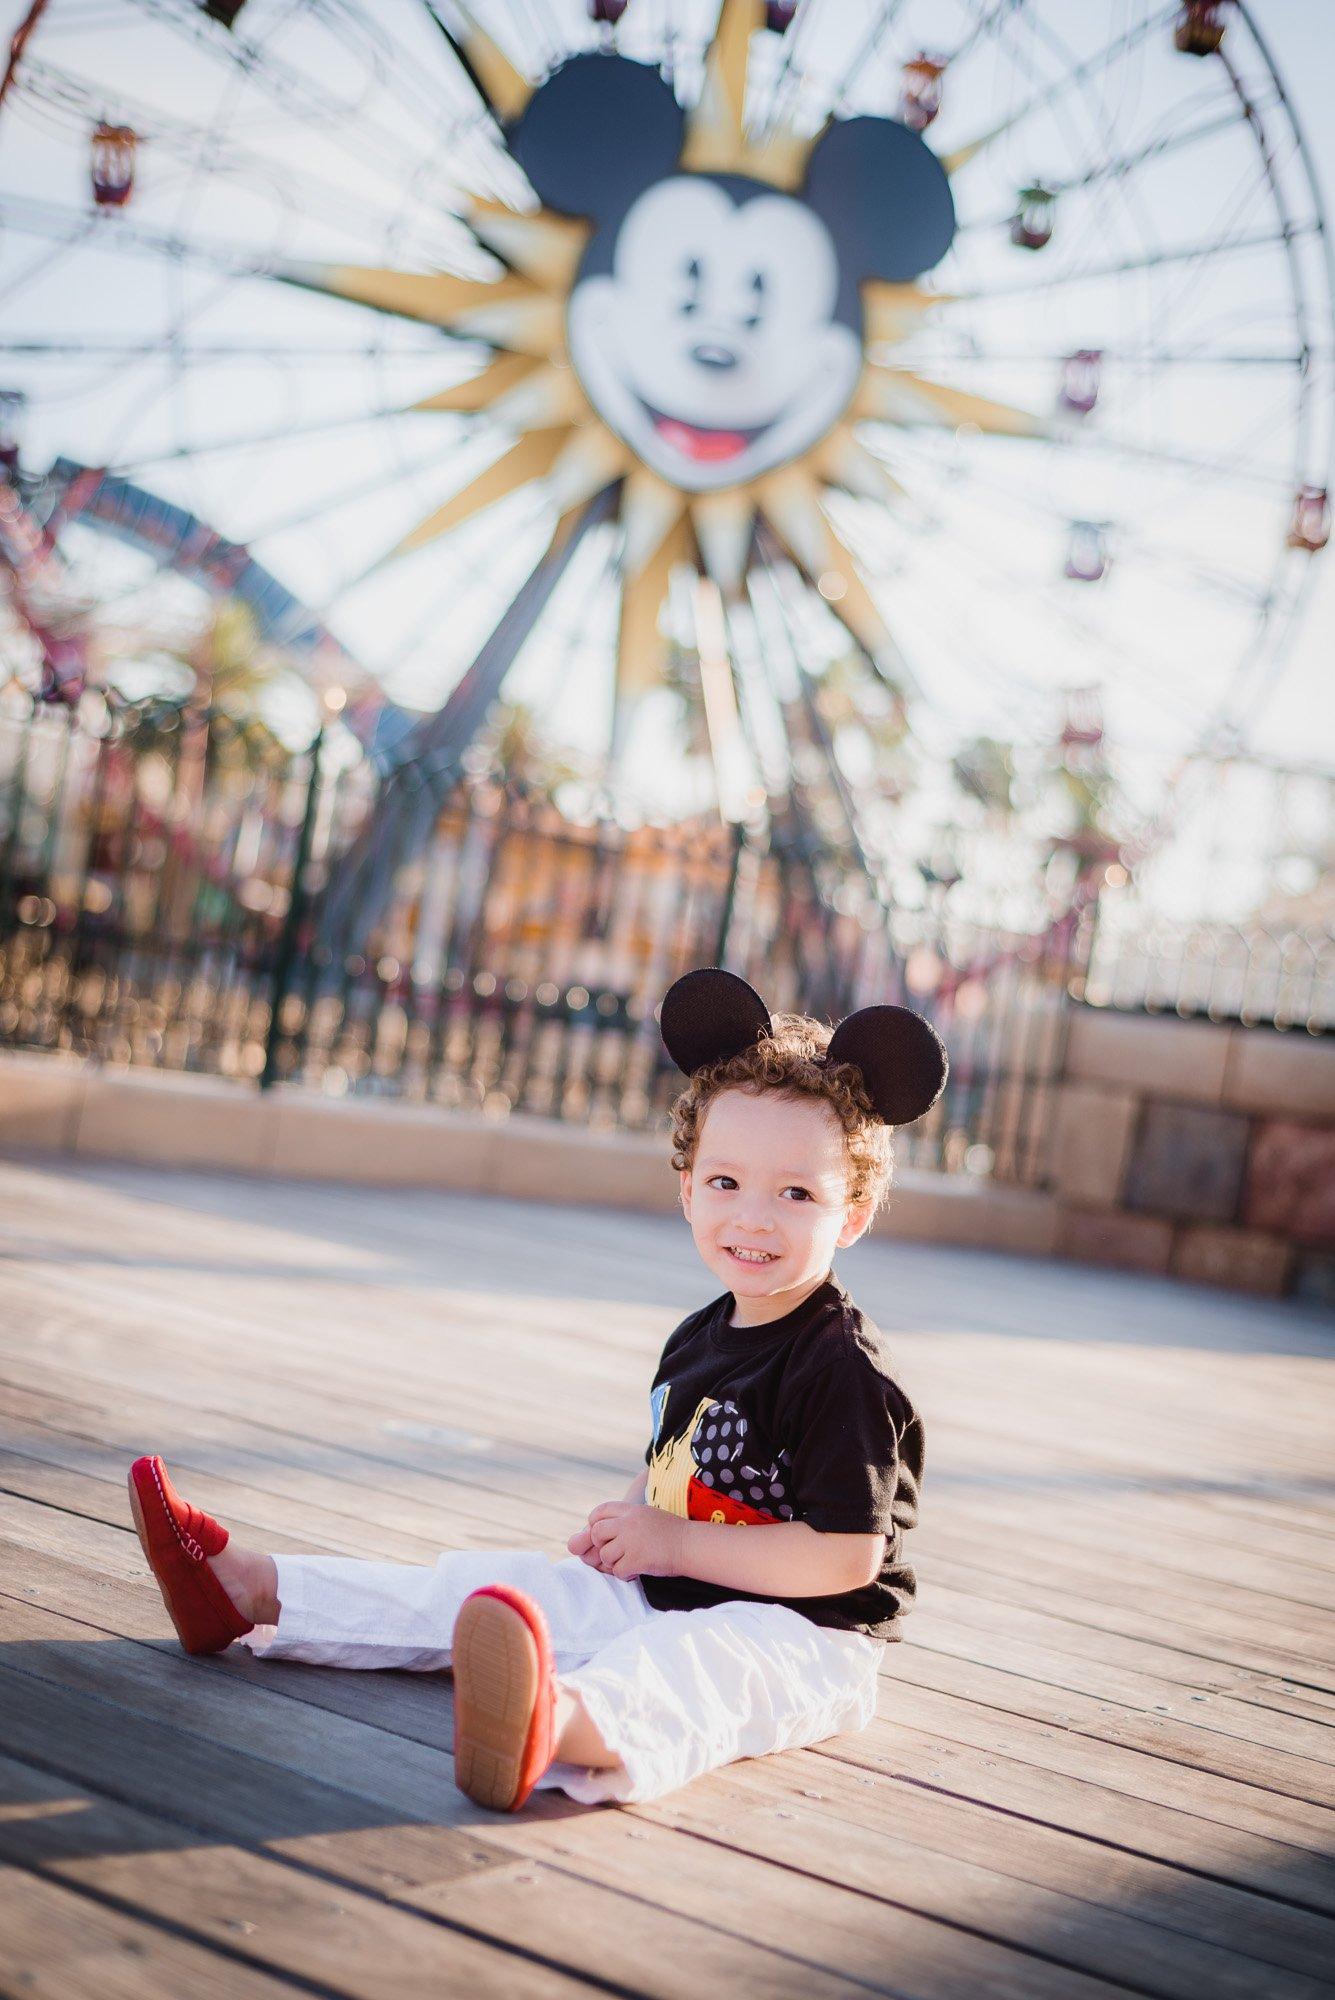 Diaz child by the ferris wheel